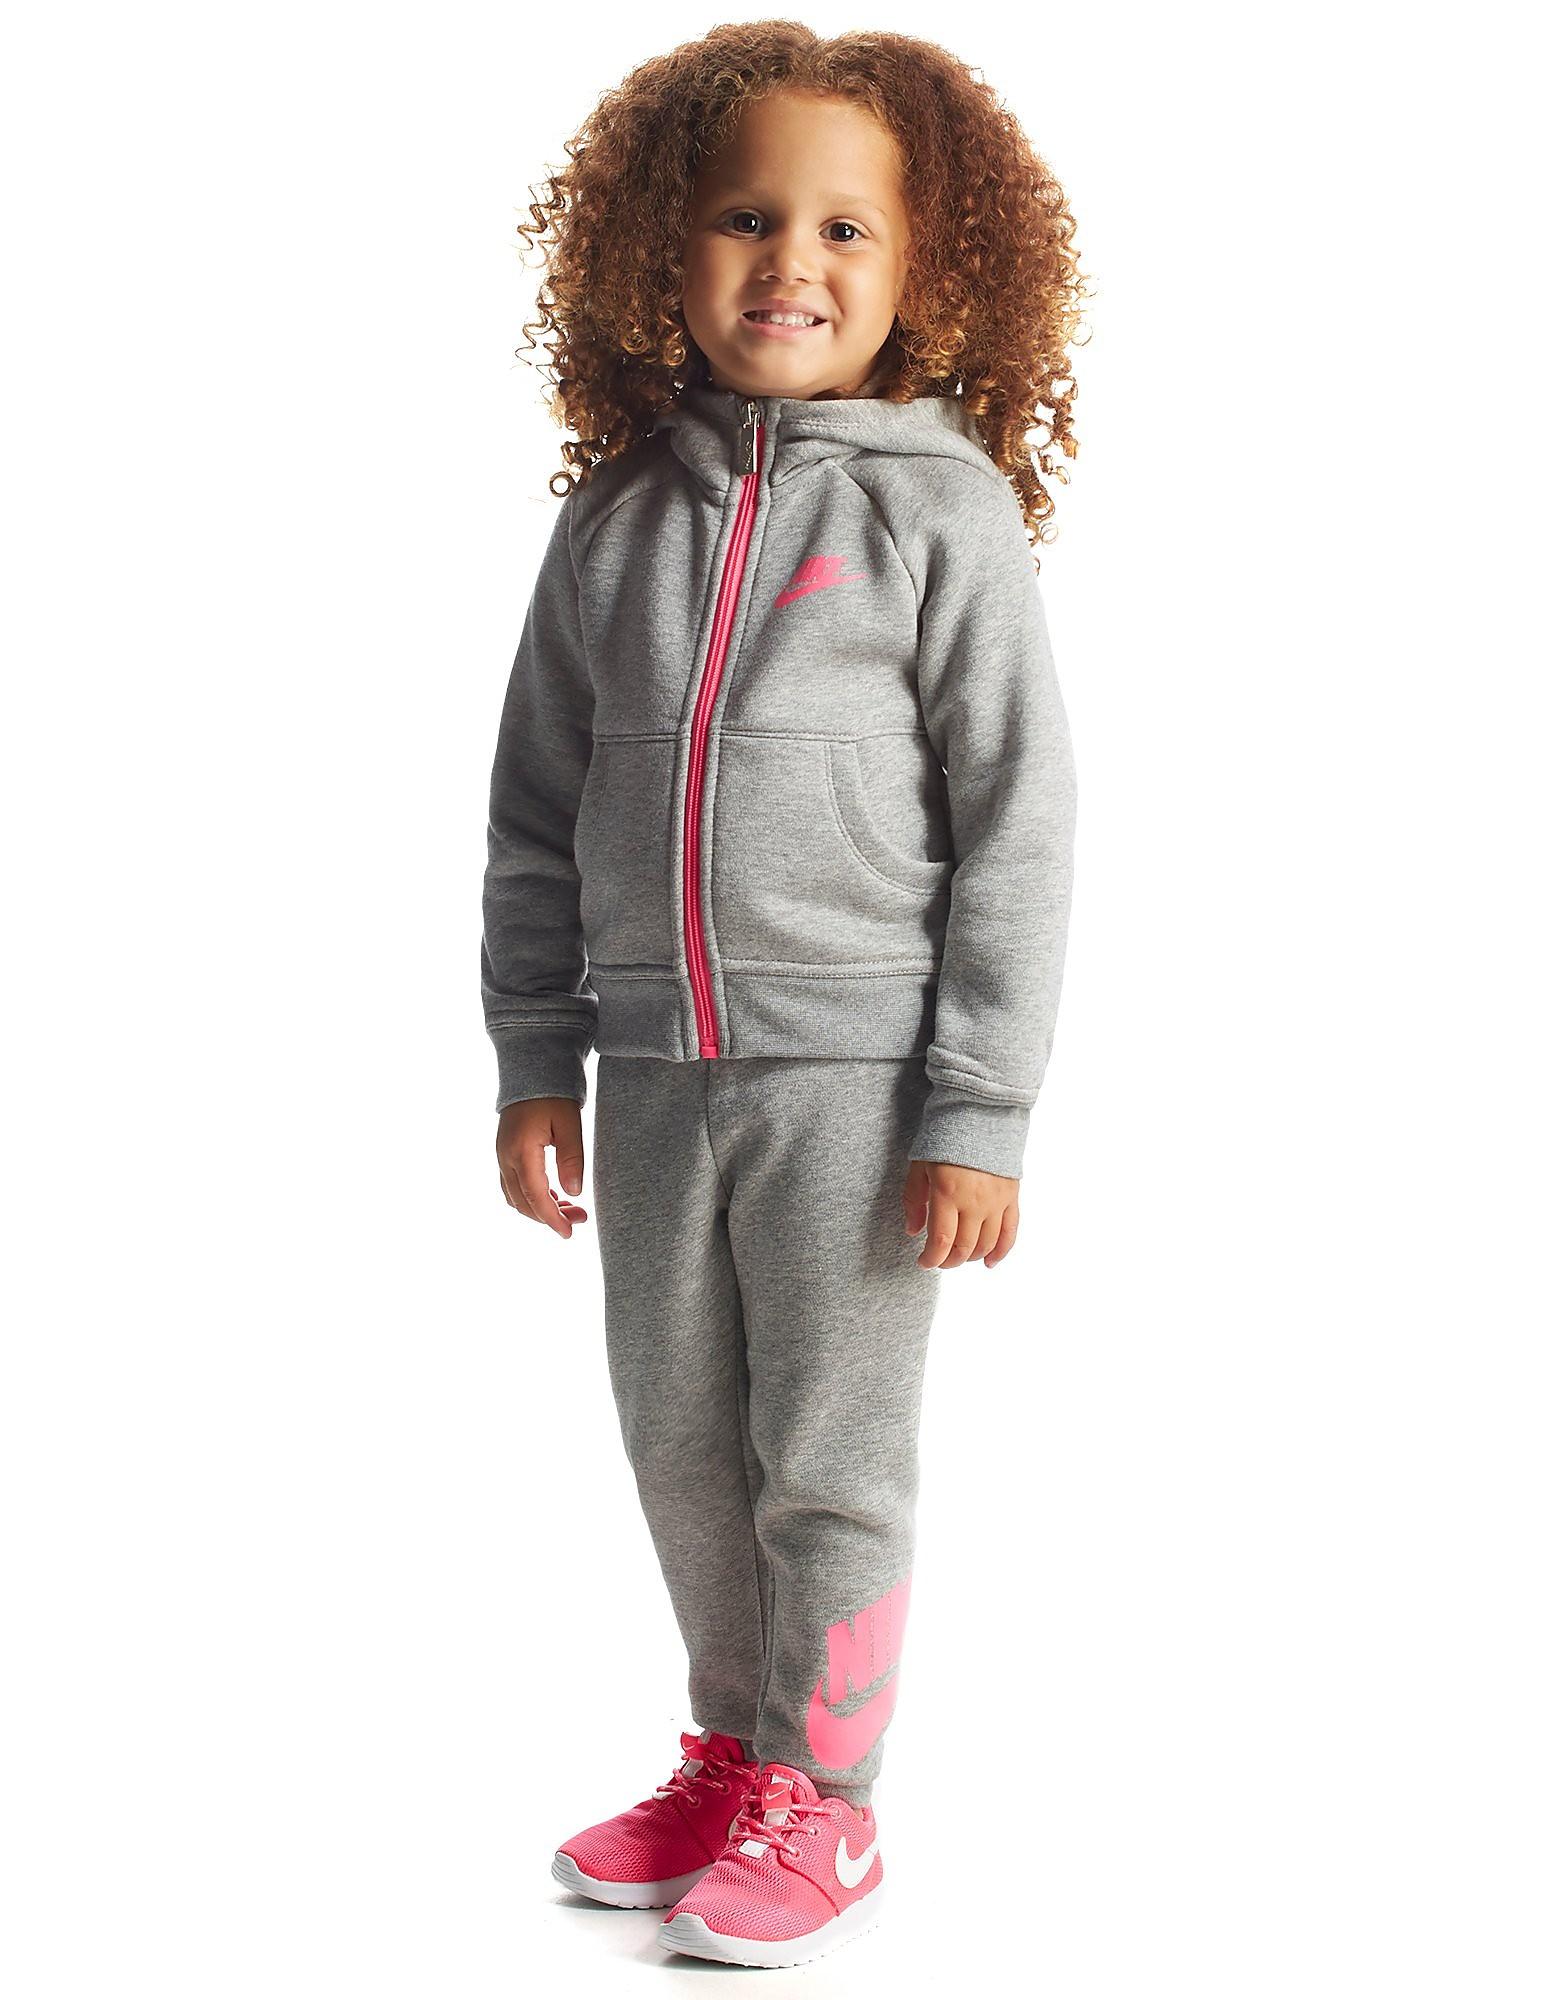 Nike Girls' Futura Suit Infant